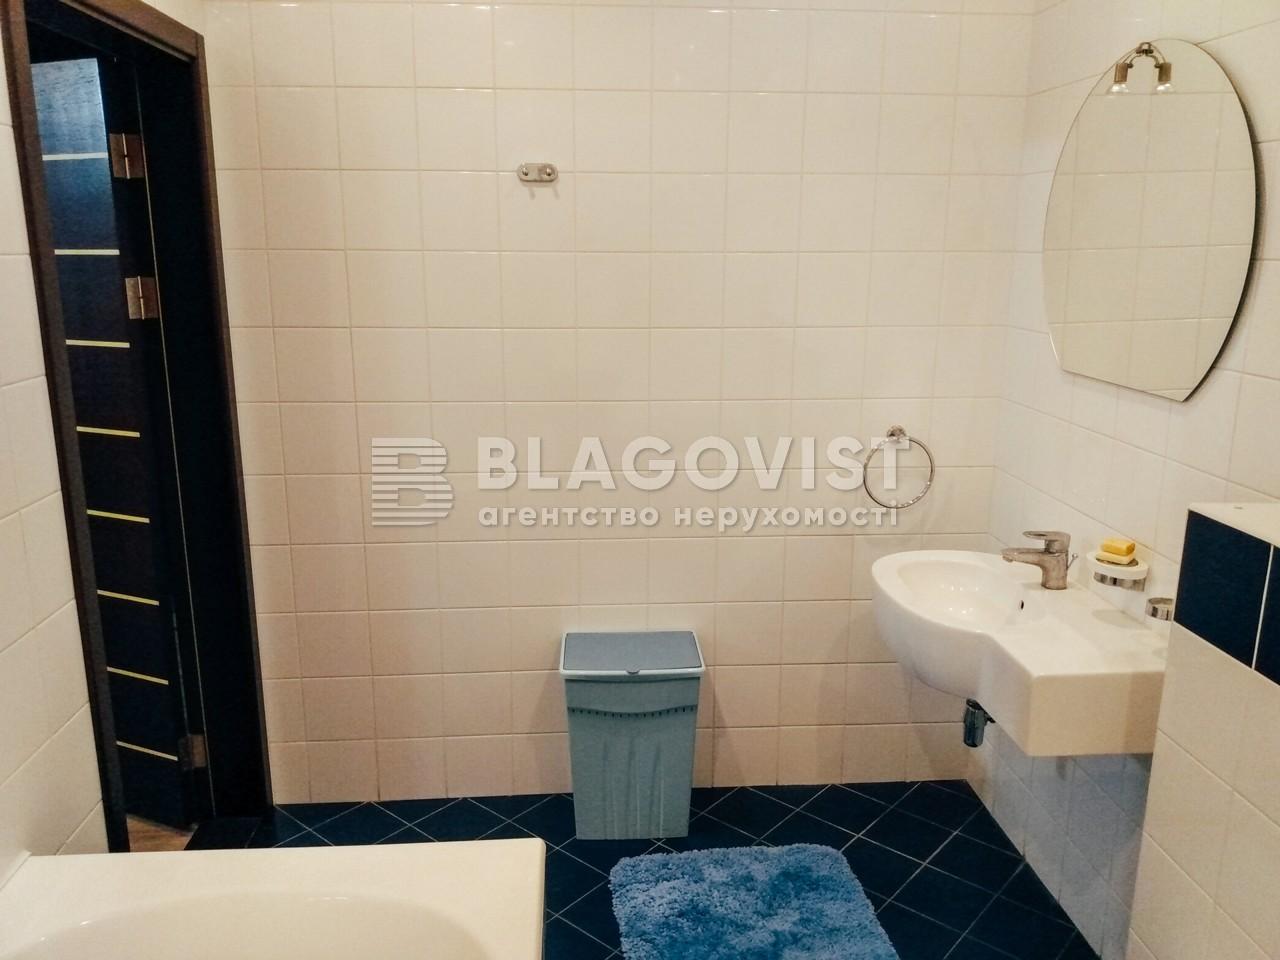 Квартира R-16873, Павловская, 17, Киев - Фото 46